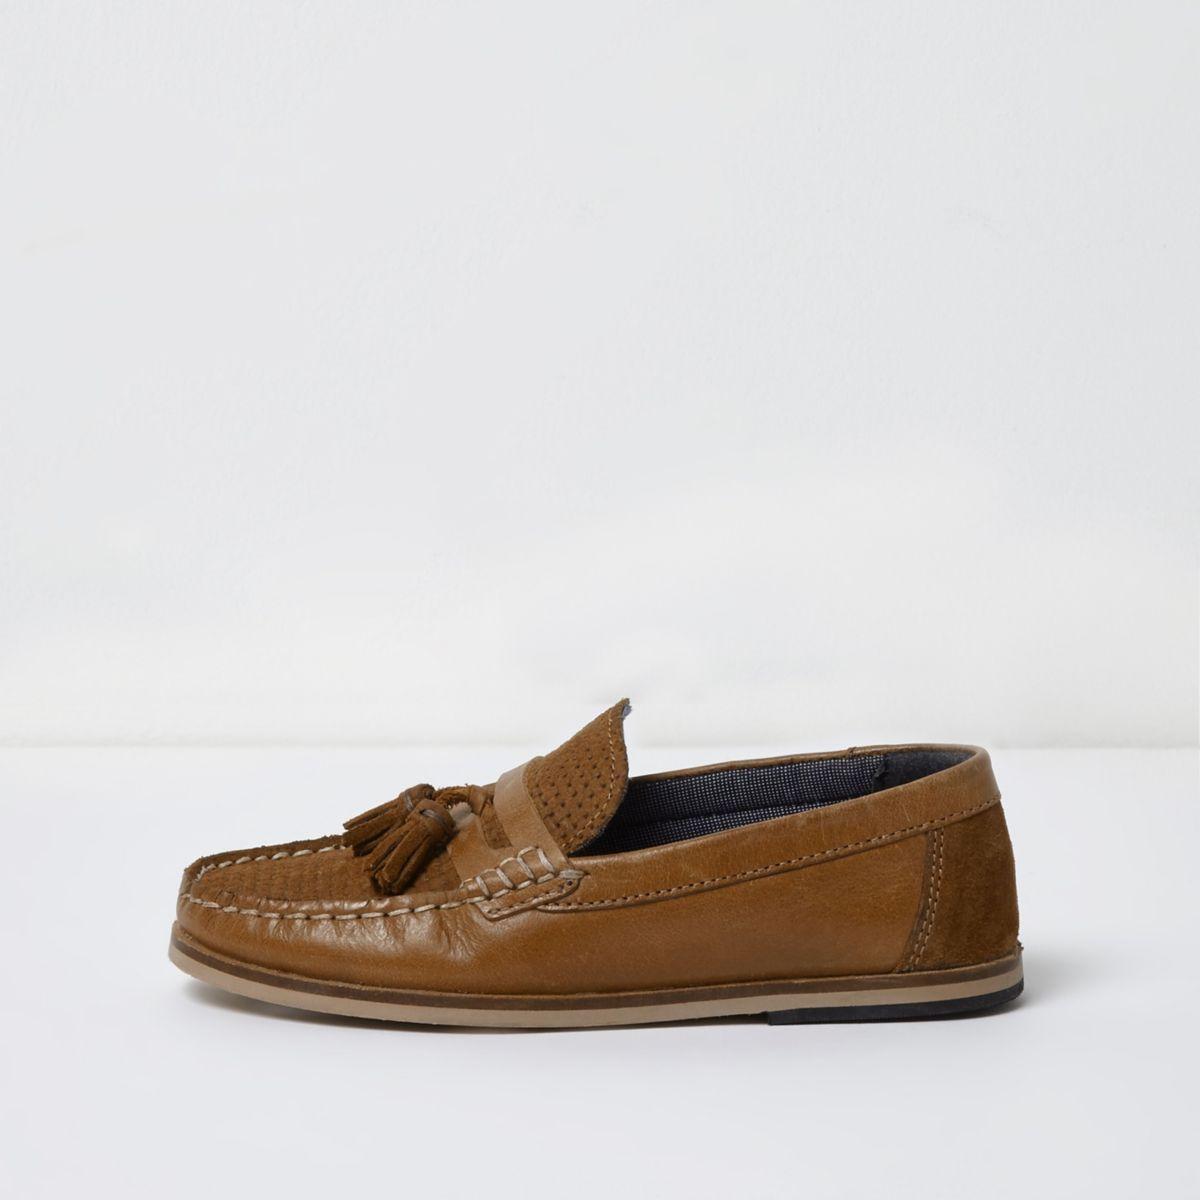 Boys tan tassel loafer